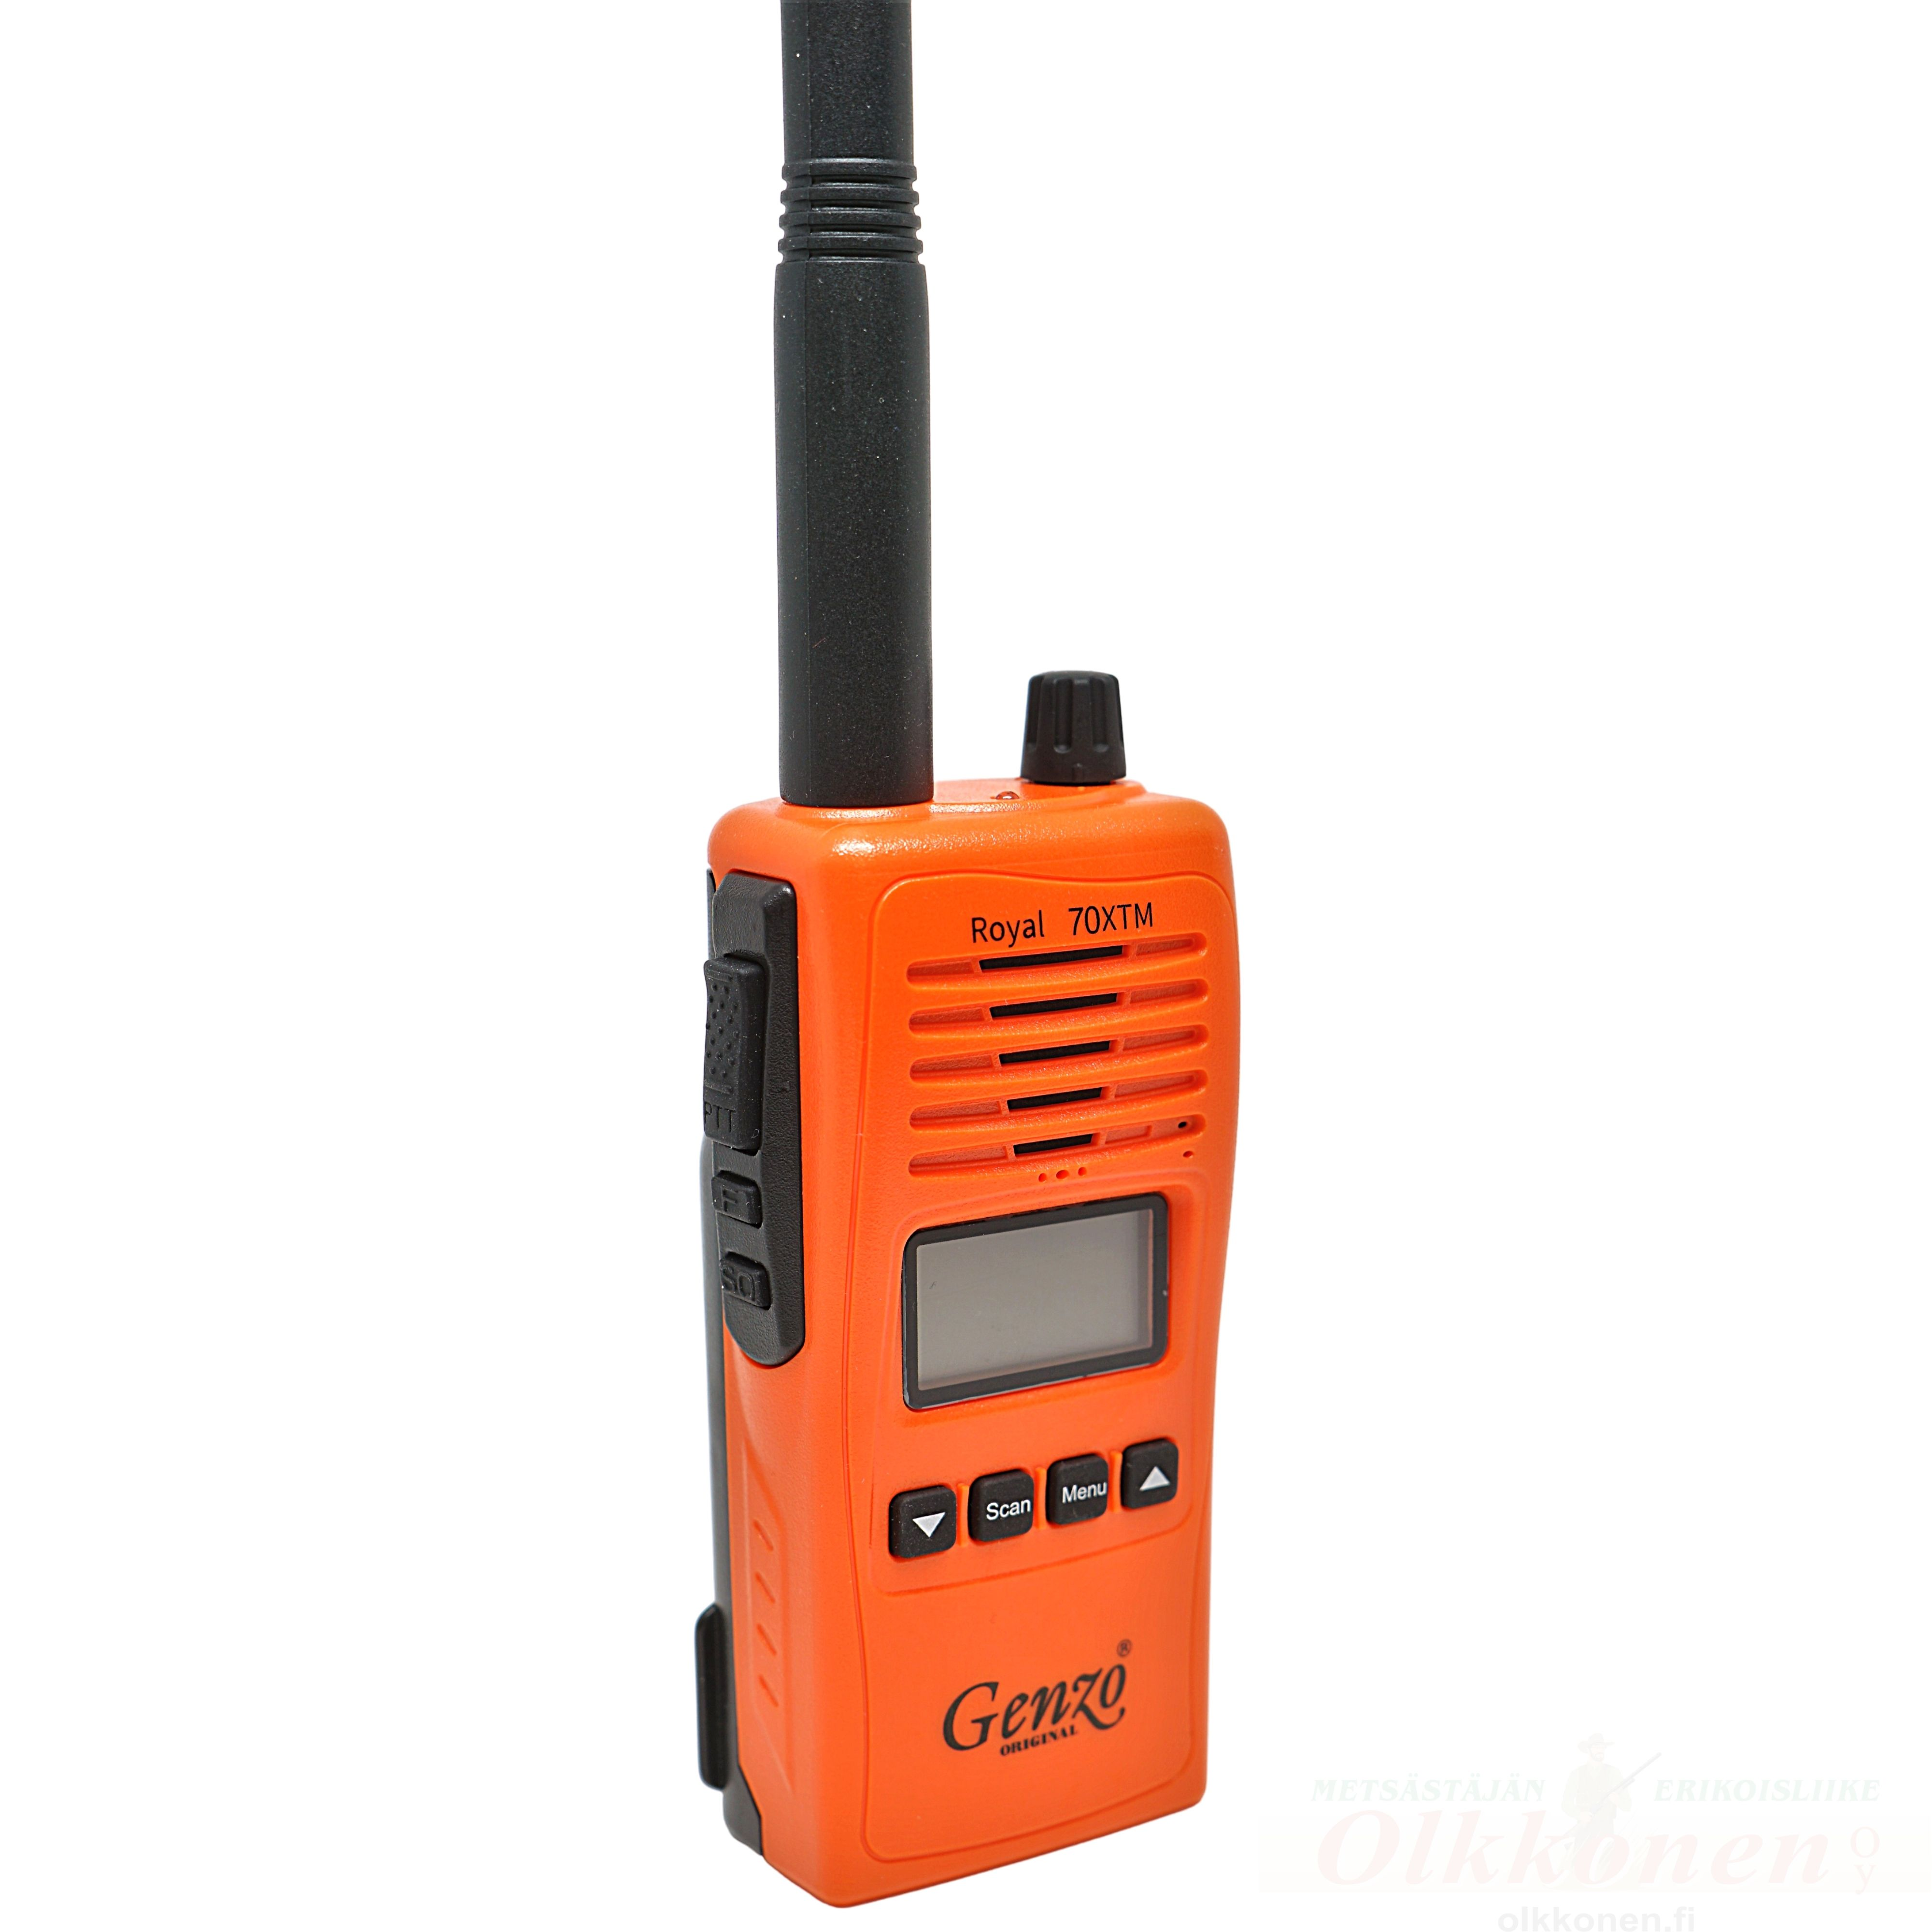 Genzo Royal 70 XTM VHF-puhelin metsästyskäyttöön